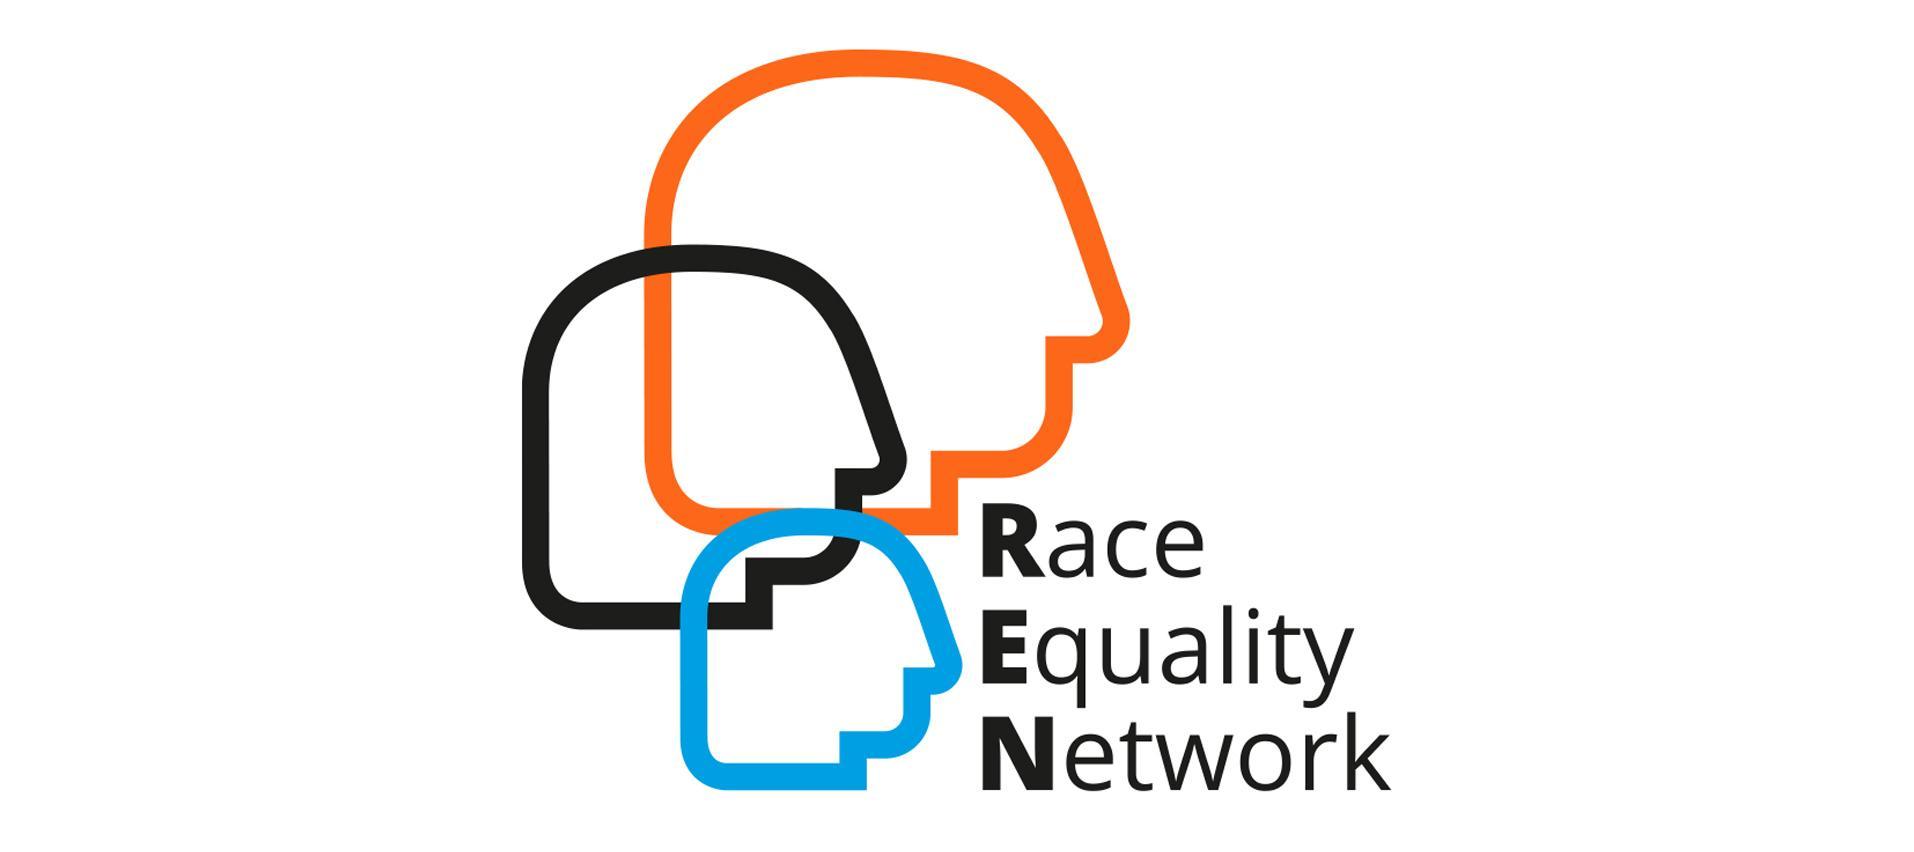 race_equality_network_logo.jpg